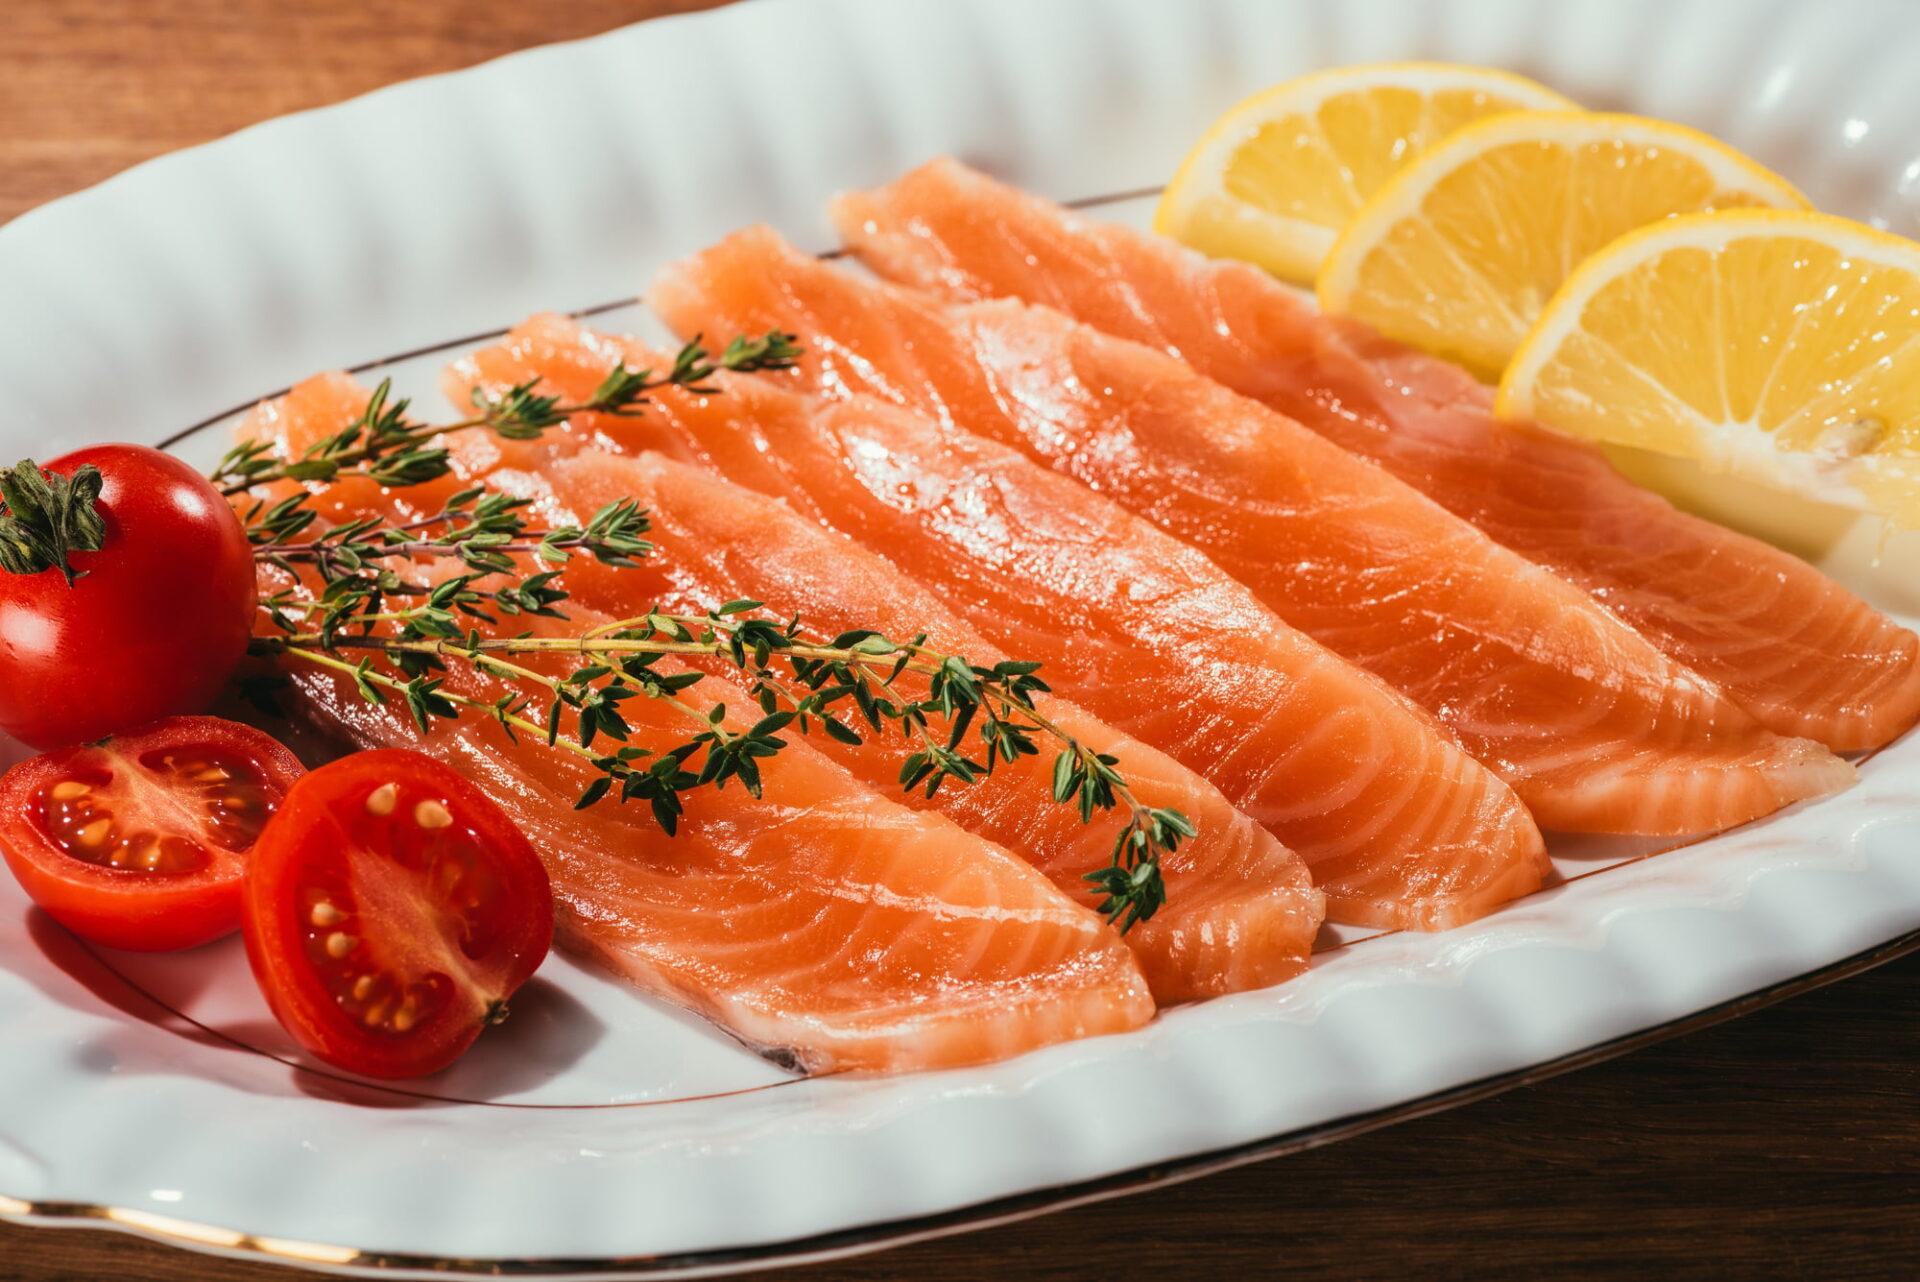 gravalax salmon on a white plate